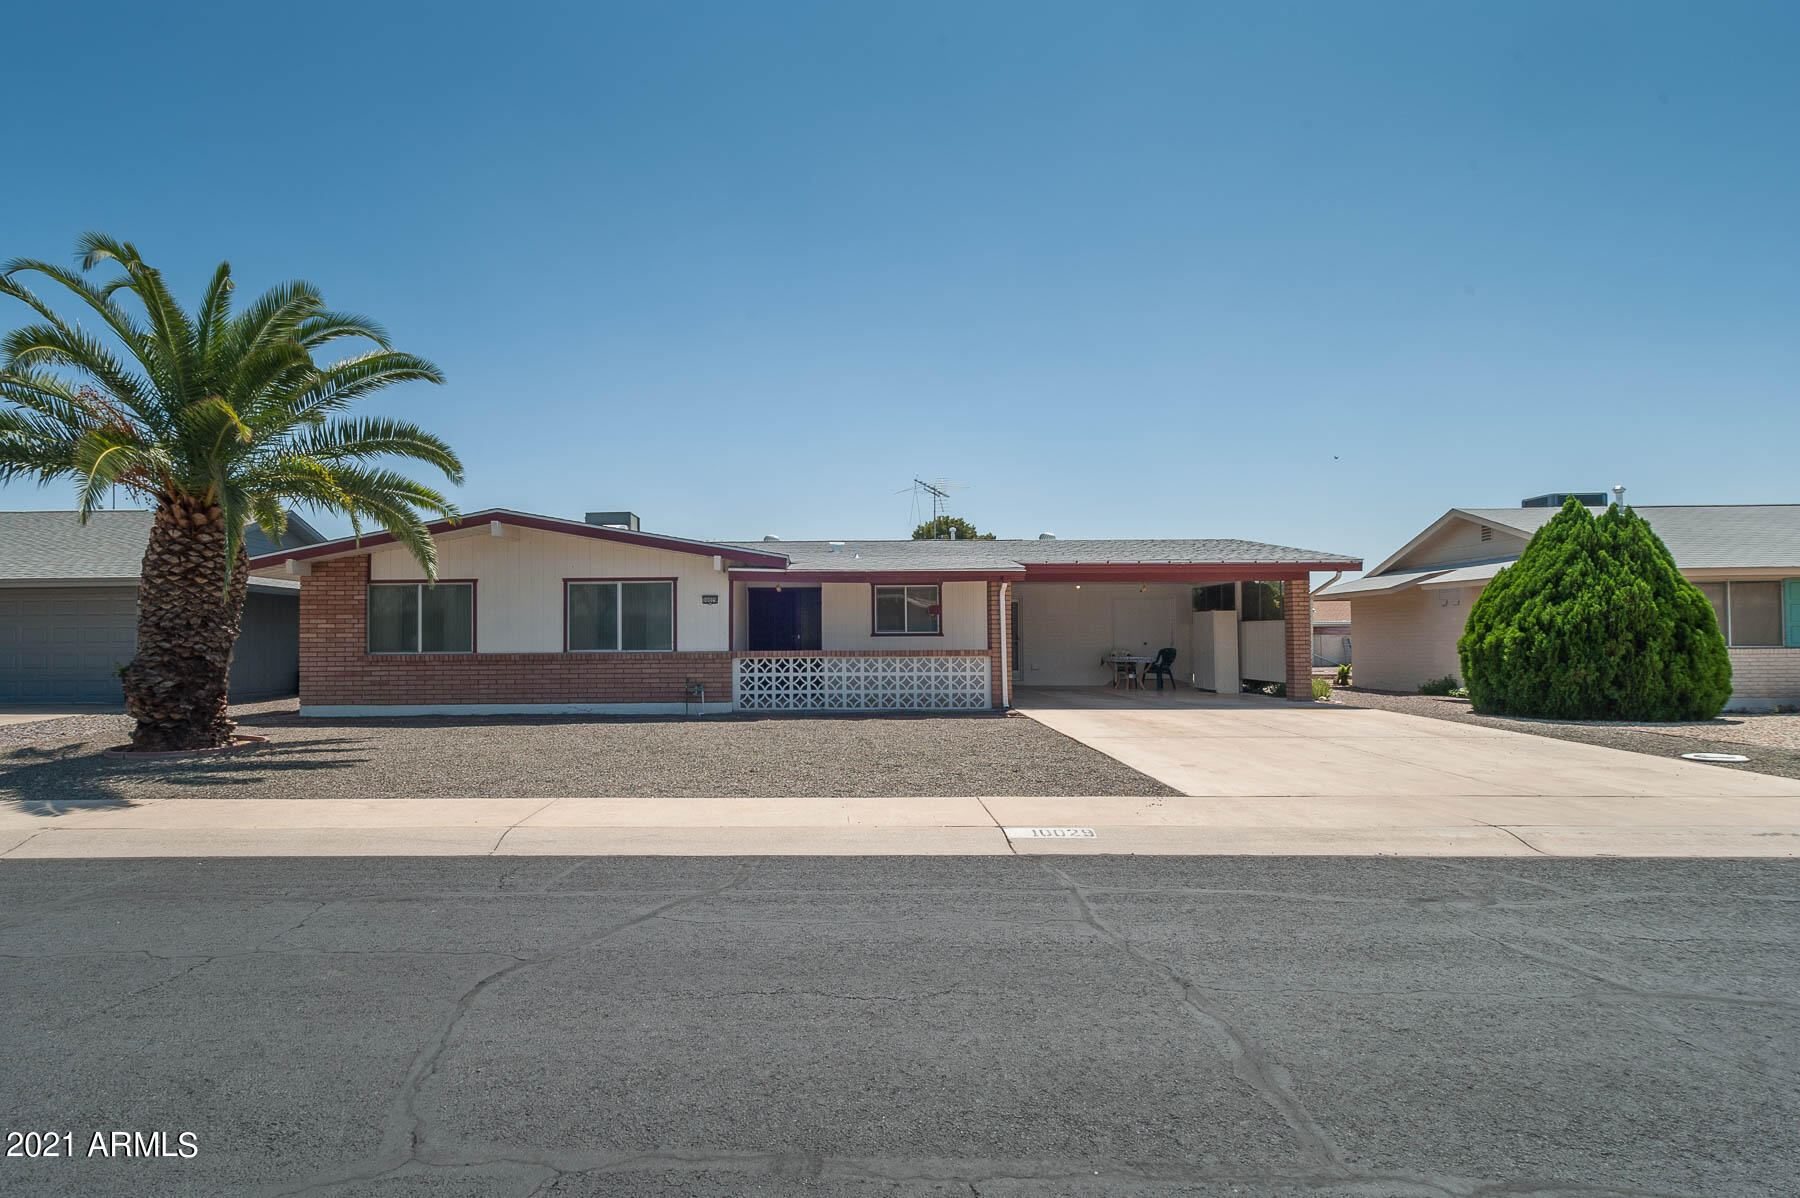 10029 W DENHAM Drive, Sun City, AZ 85351 - MLS#: 6284686